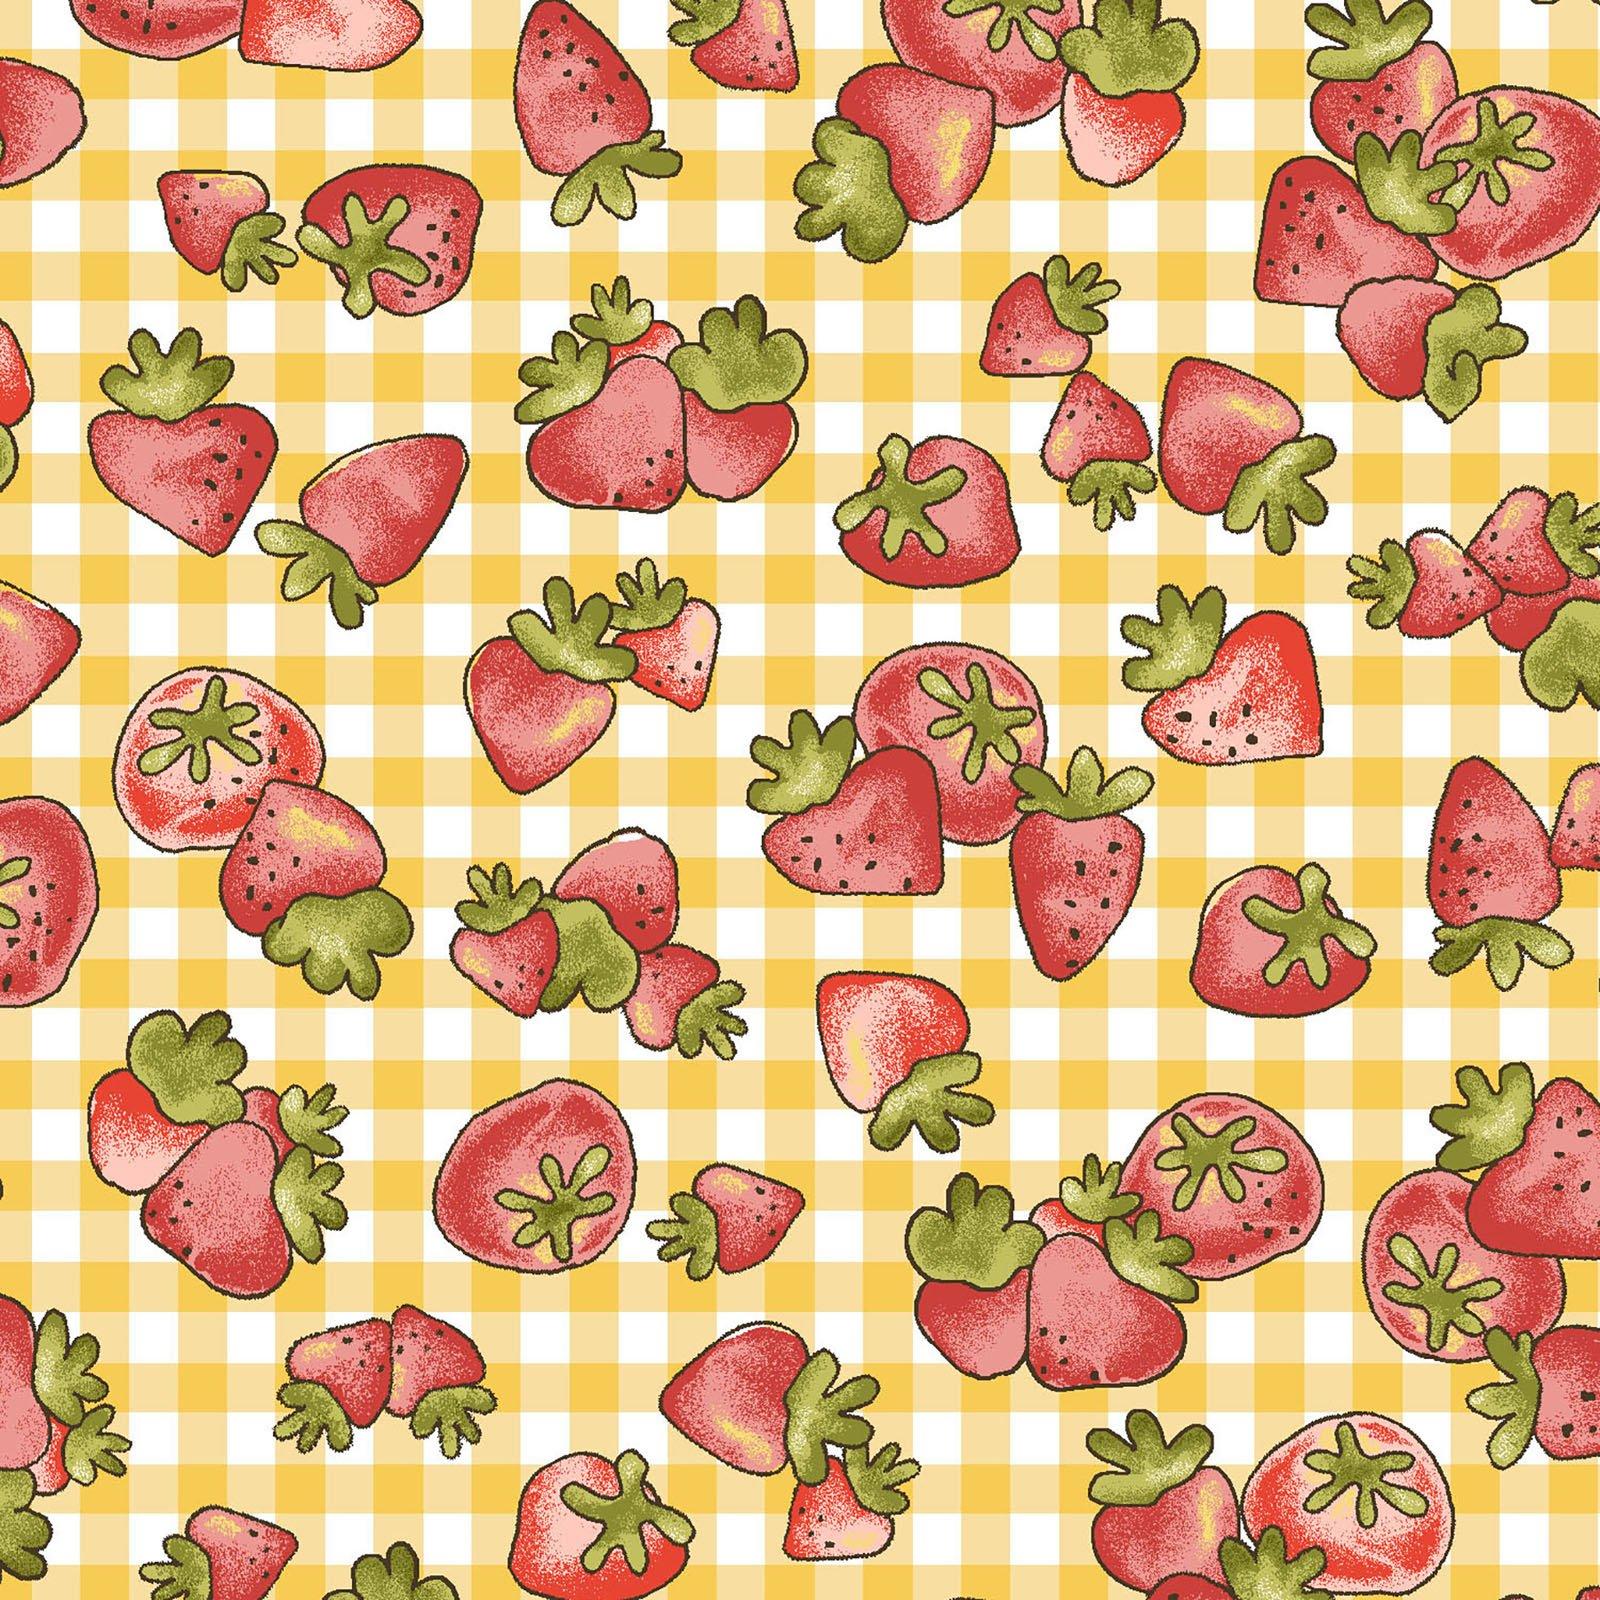 Strawberries - Yellow Check<br/>Henry Glass 6723-44